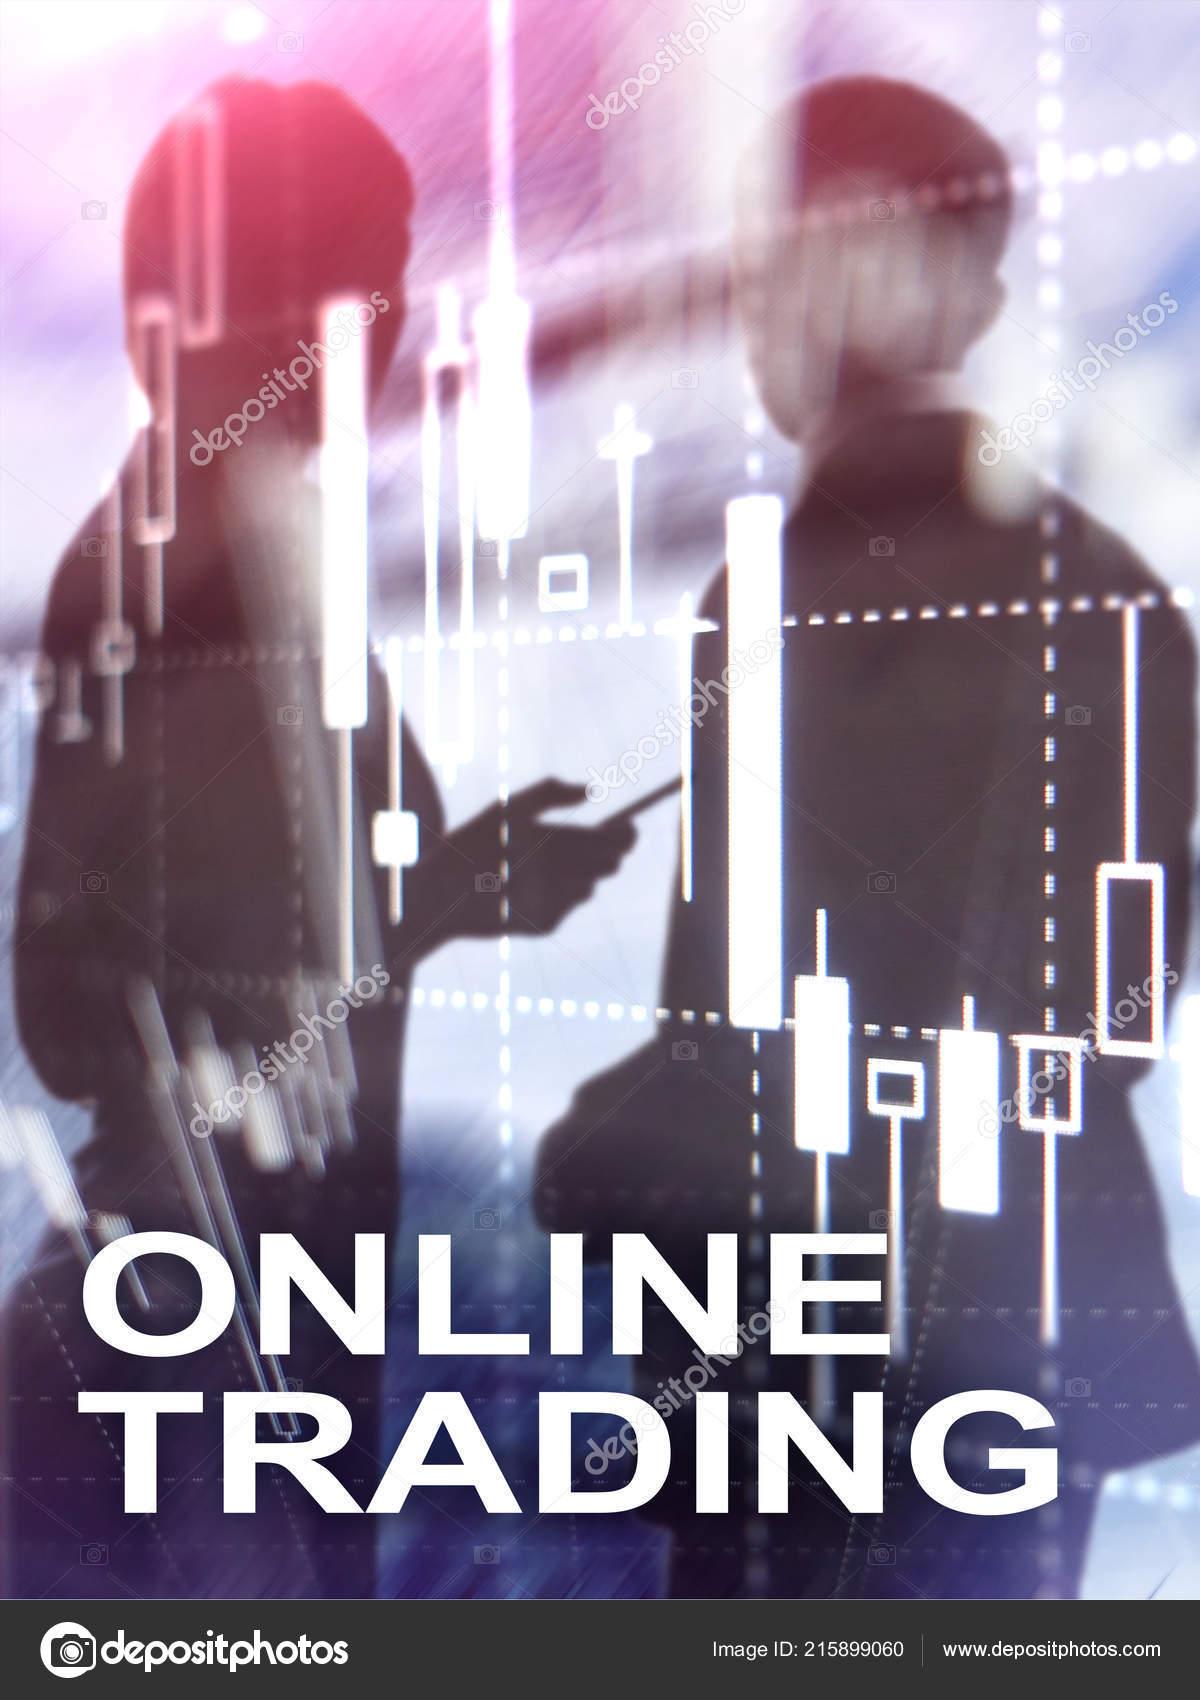 Форекс фильмы онлайн динамика курса биткоина к доллару за год